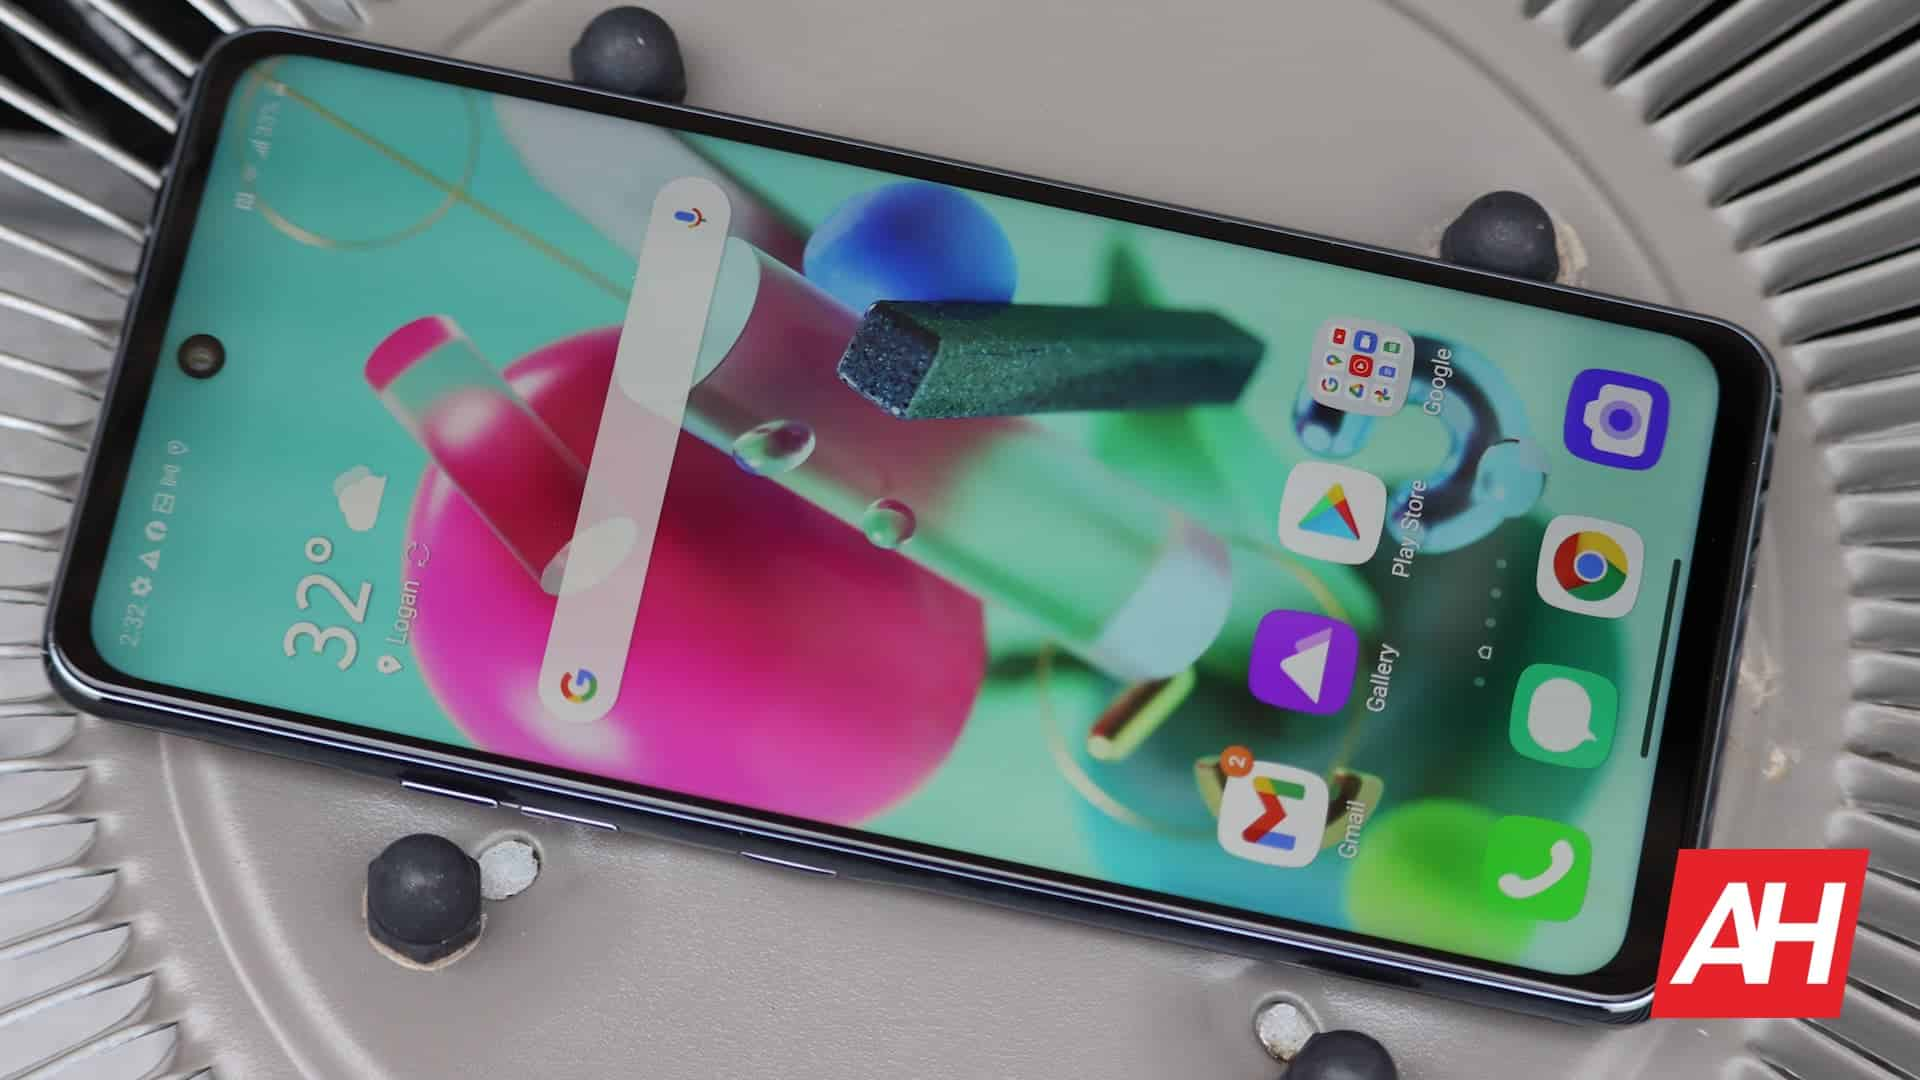 01 5 LG K92 5G Review Hardware DG AH 2020